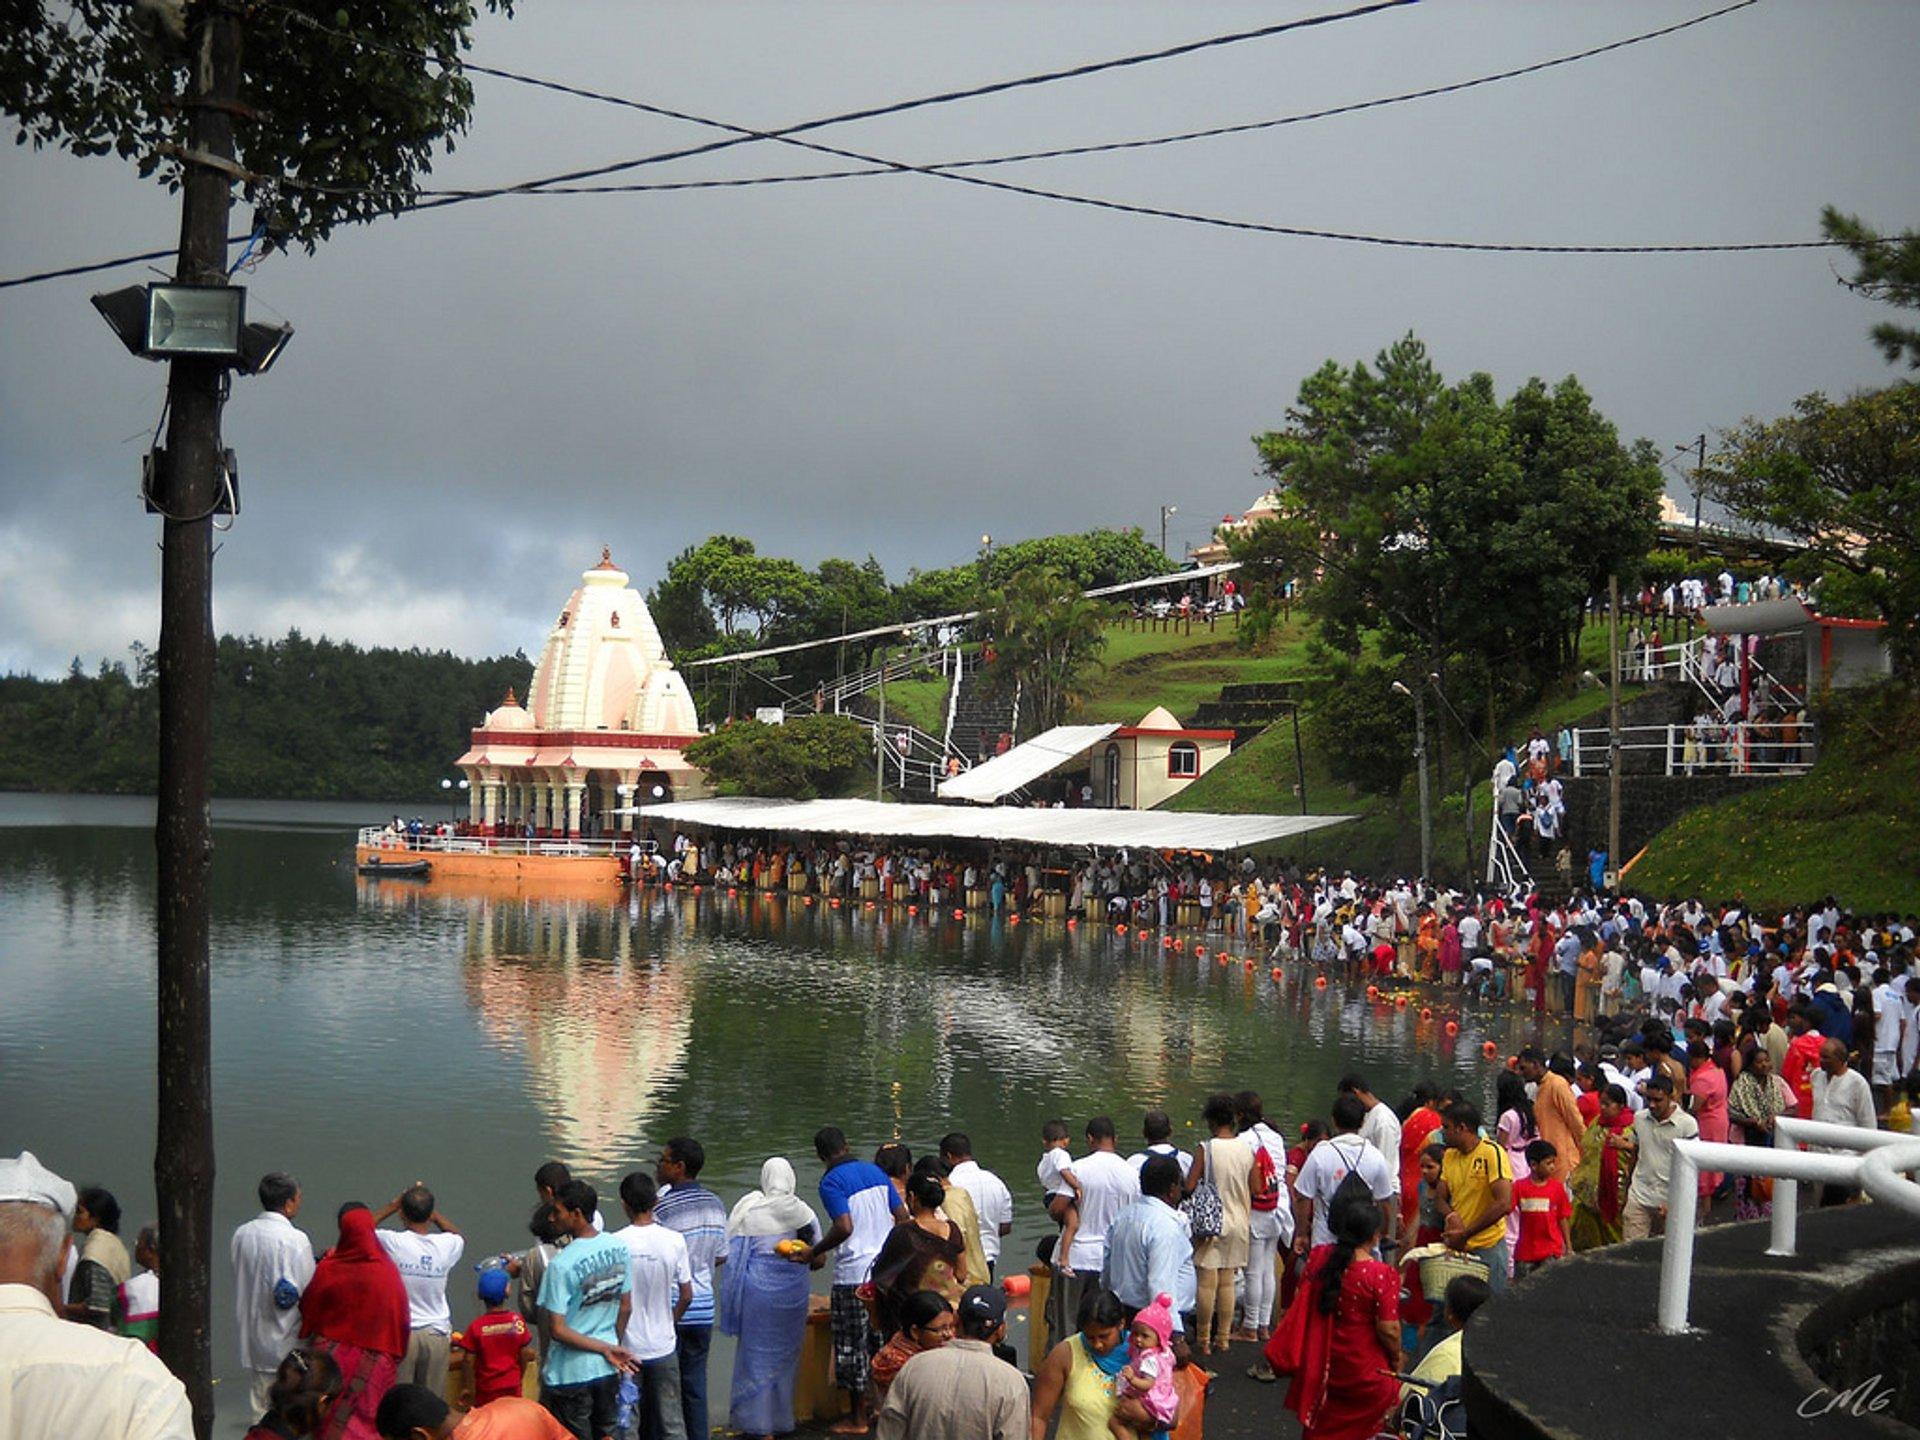 Maha Shivaratree Celebration in Mauritius - Best Season 2020